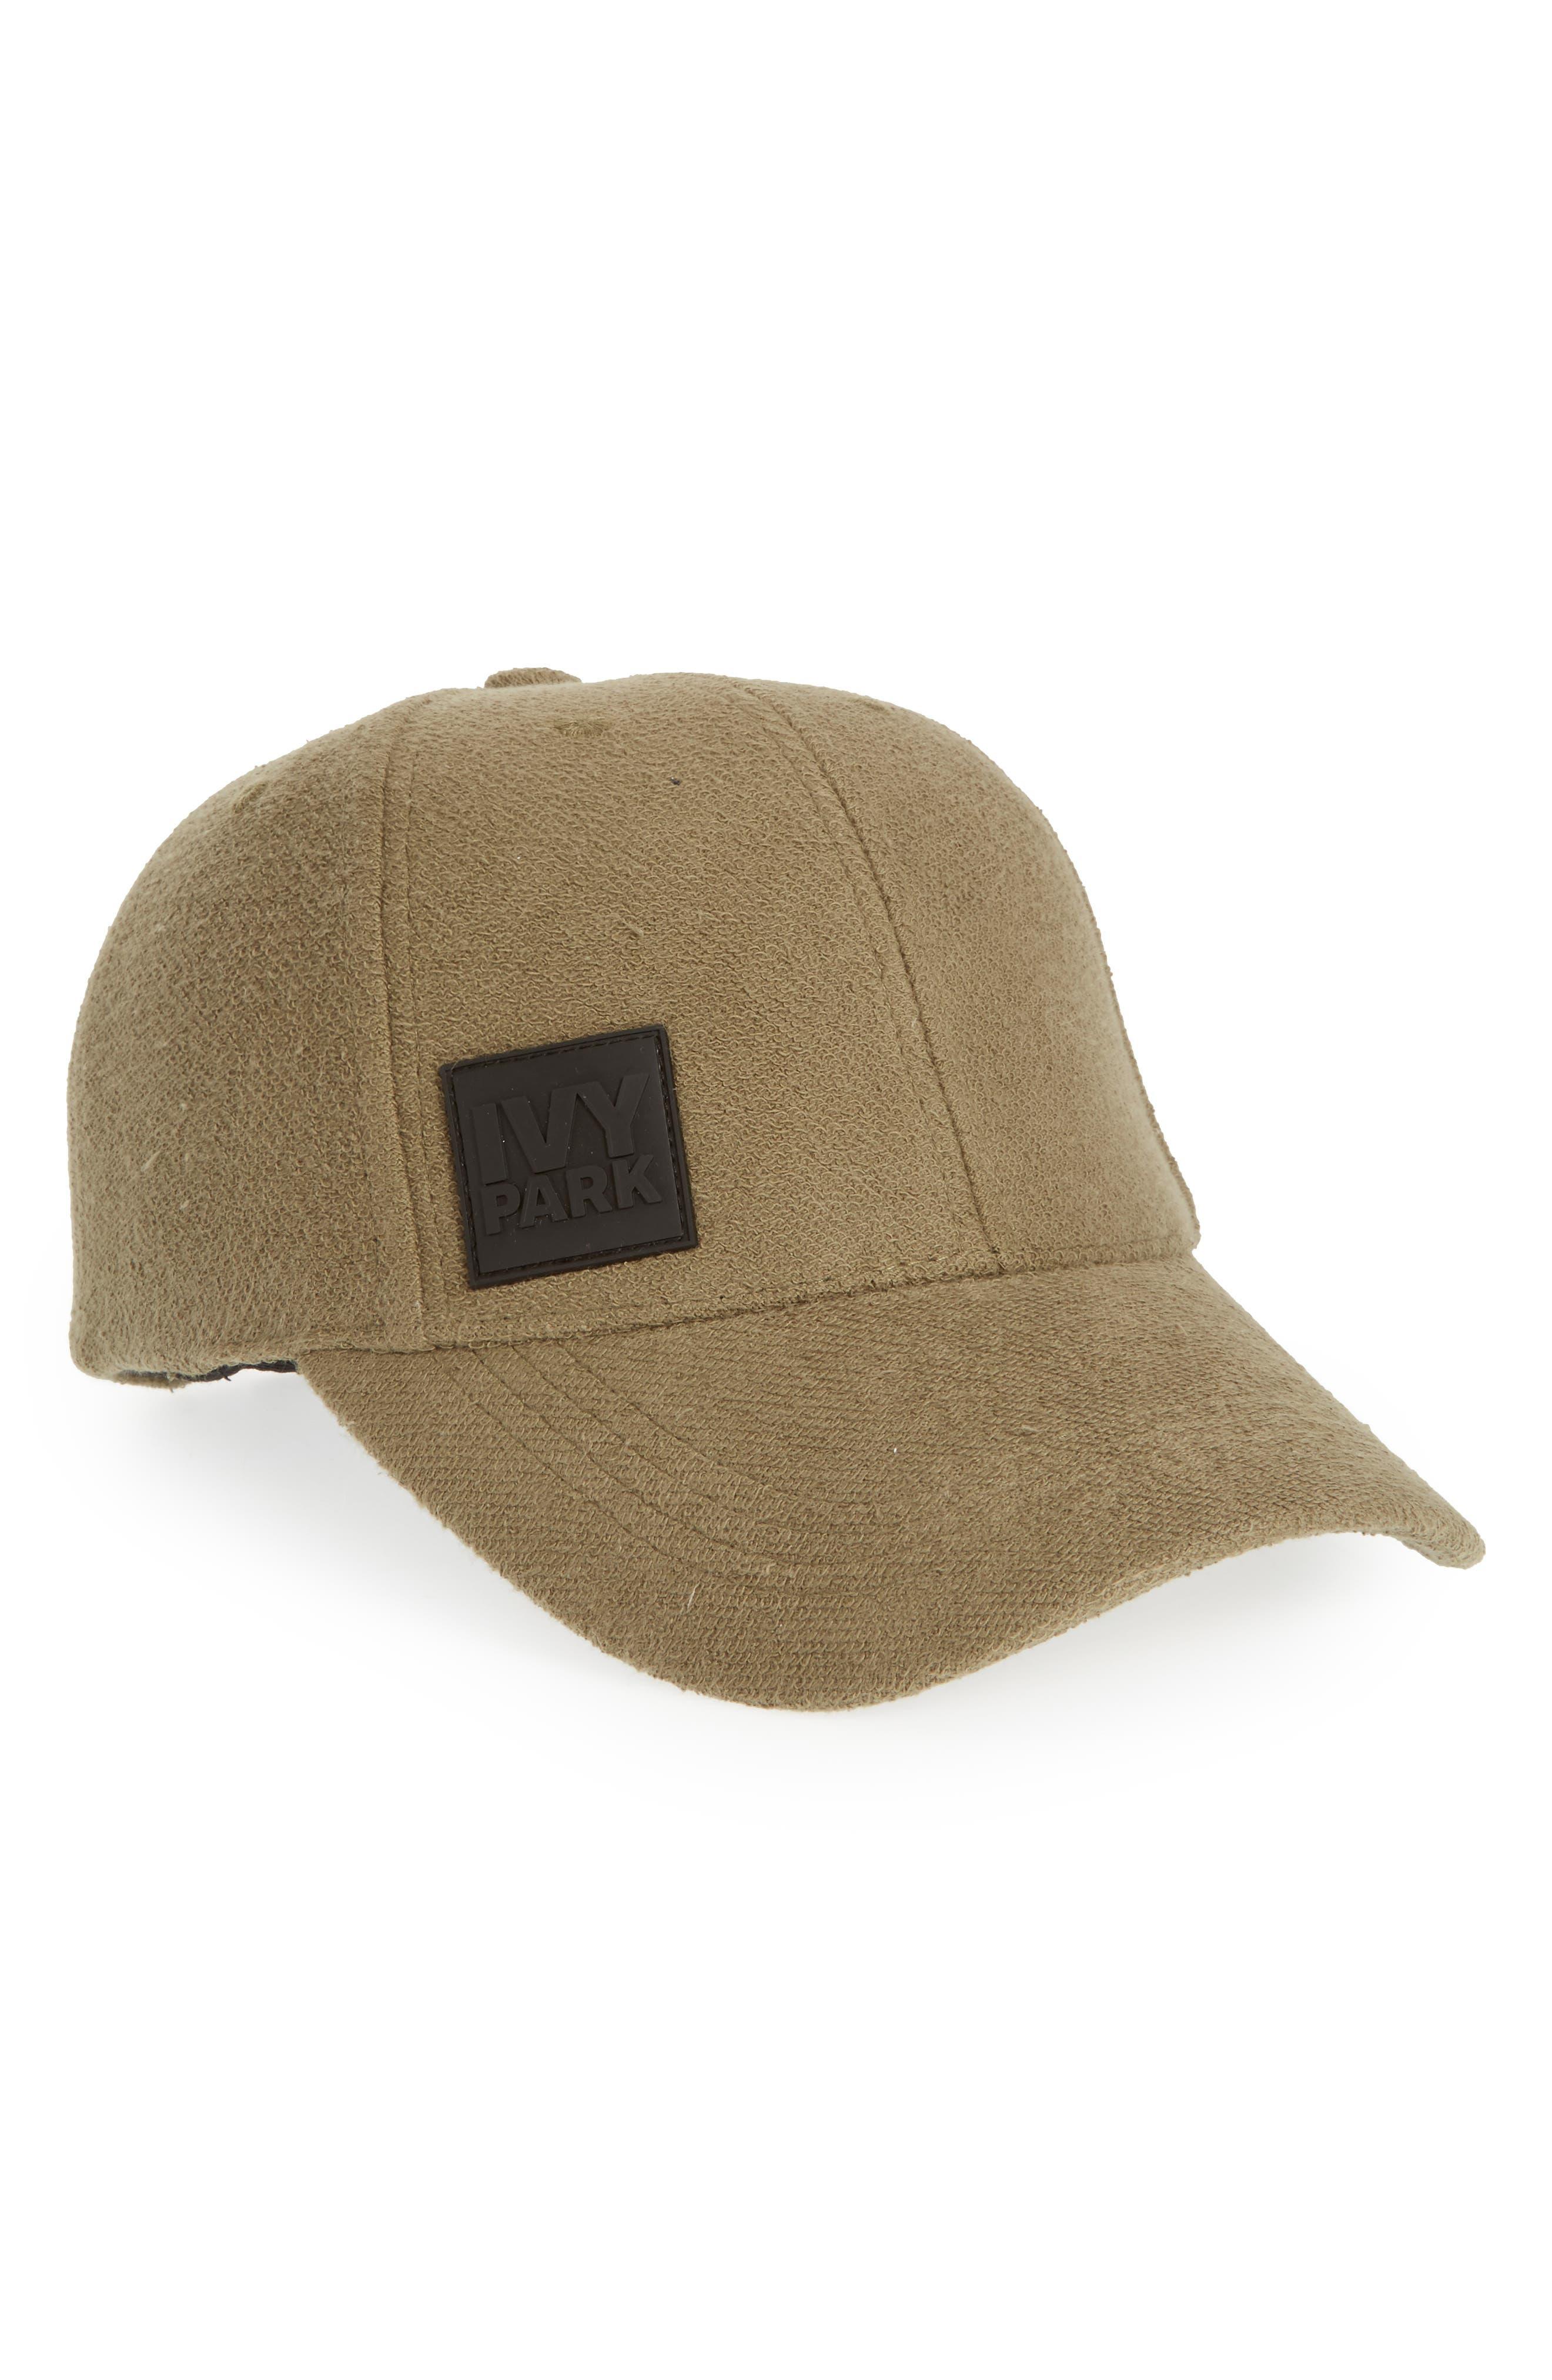 IVY PARK® Loopback Jersey Baseball Cap